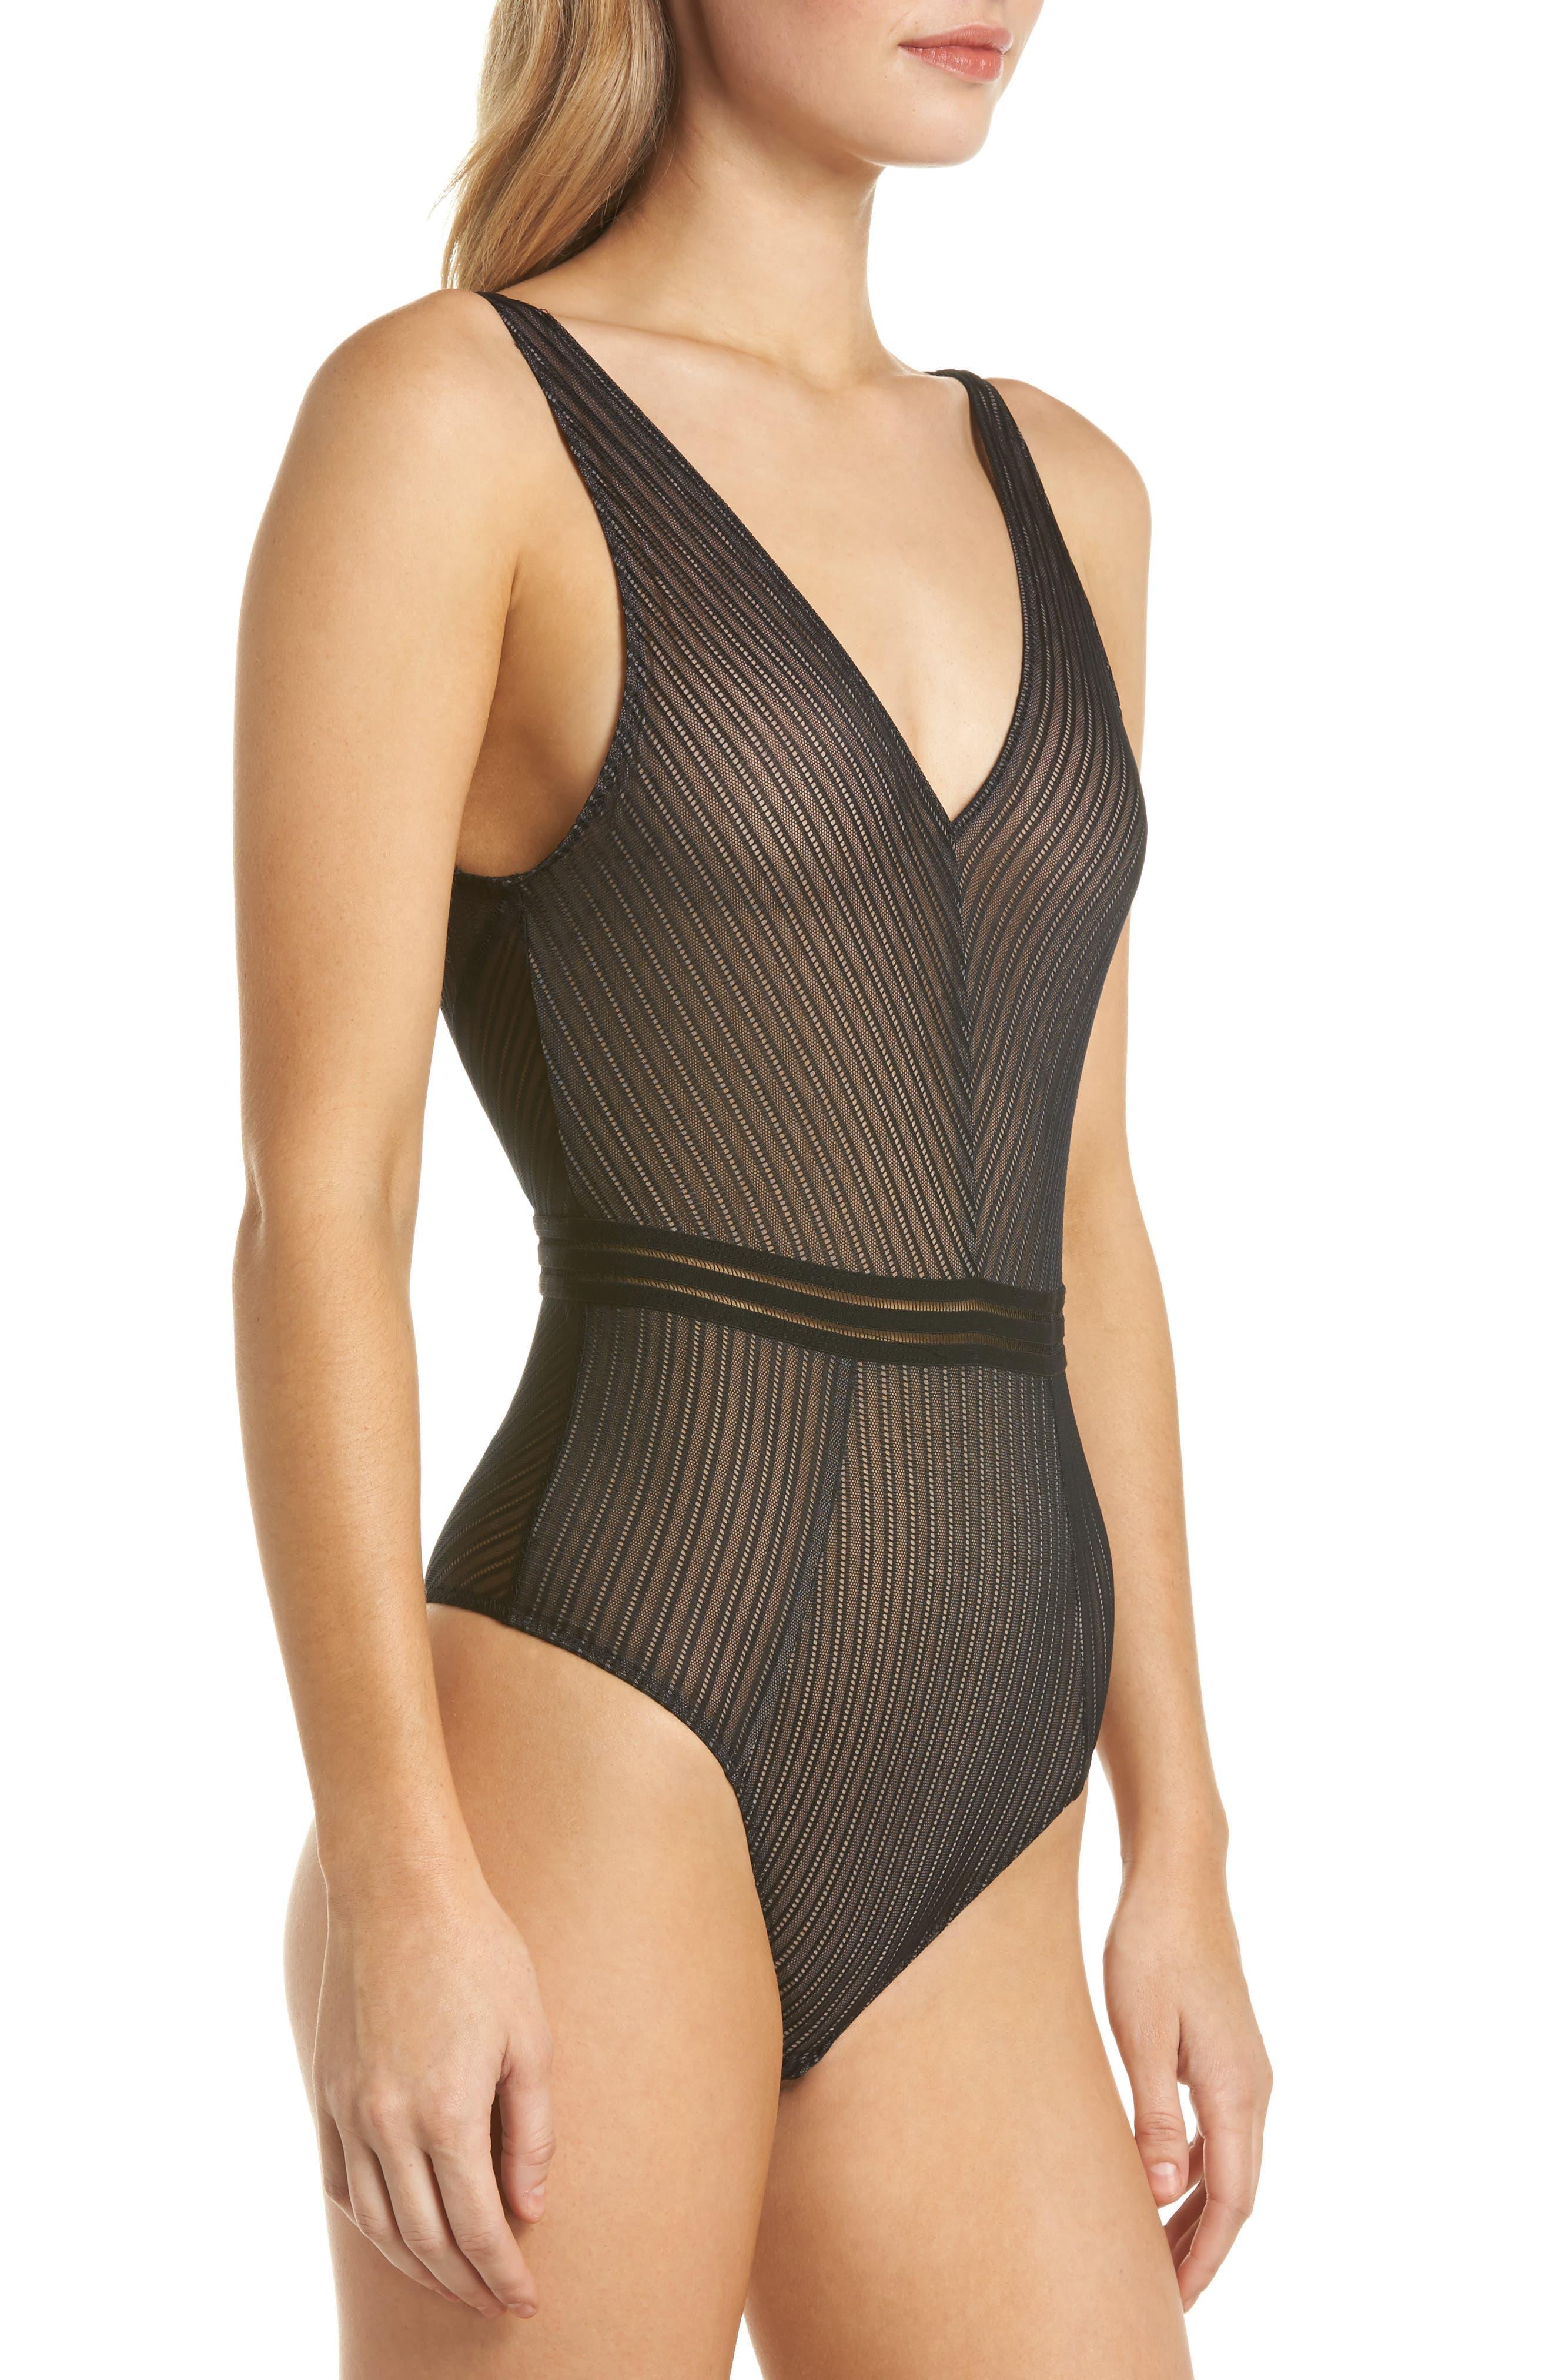 Arabella Thong Bodysuit,                             Alternate thumbnail 3, color,                             Black